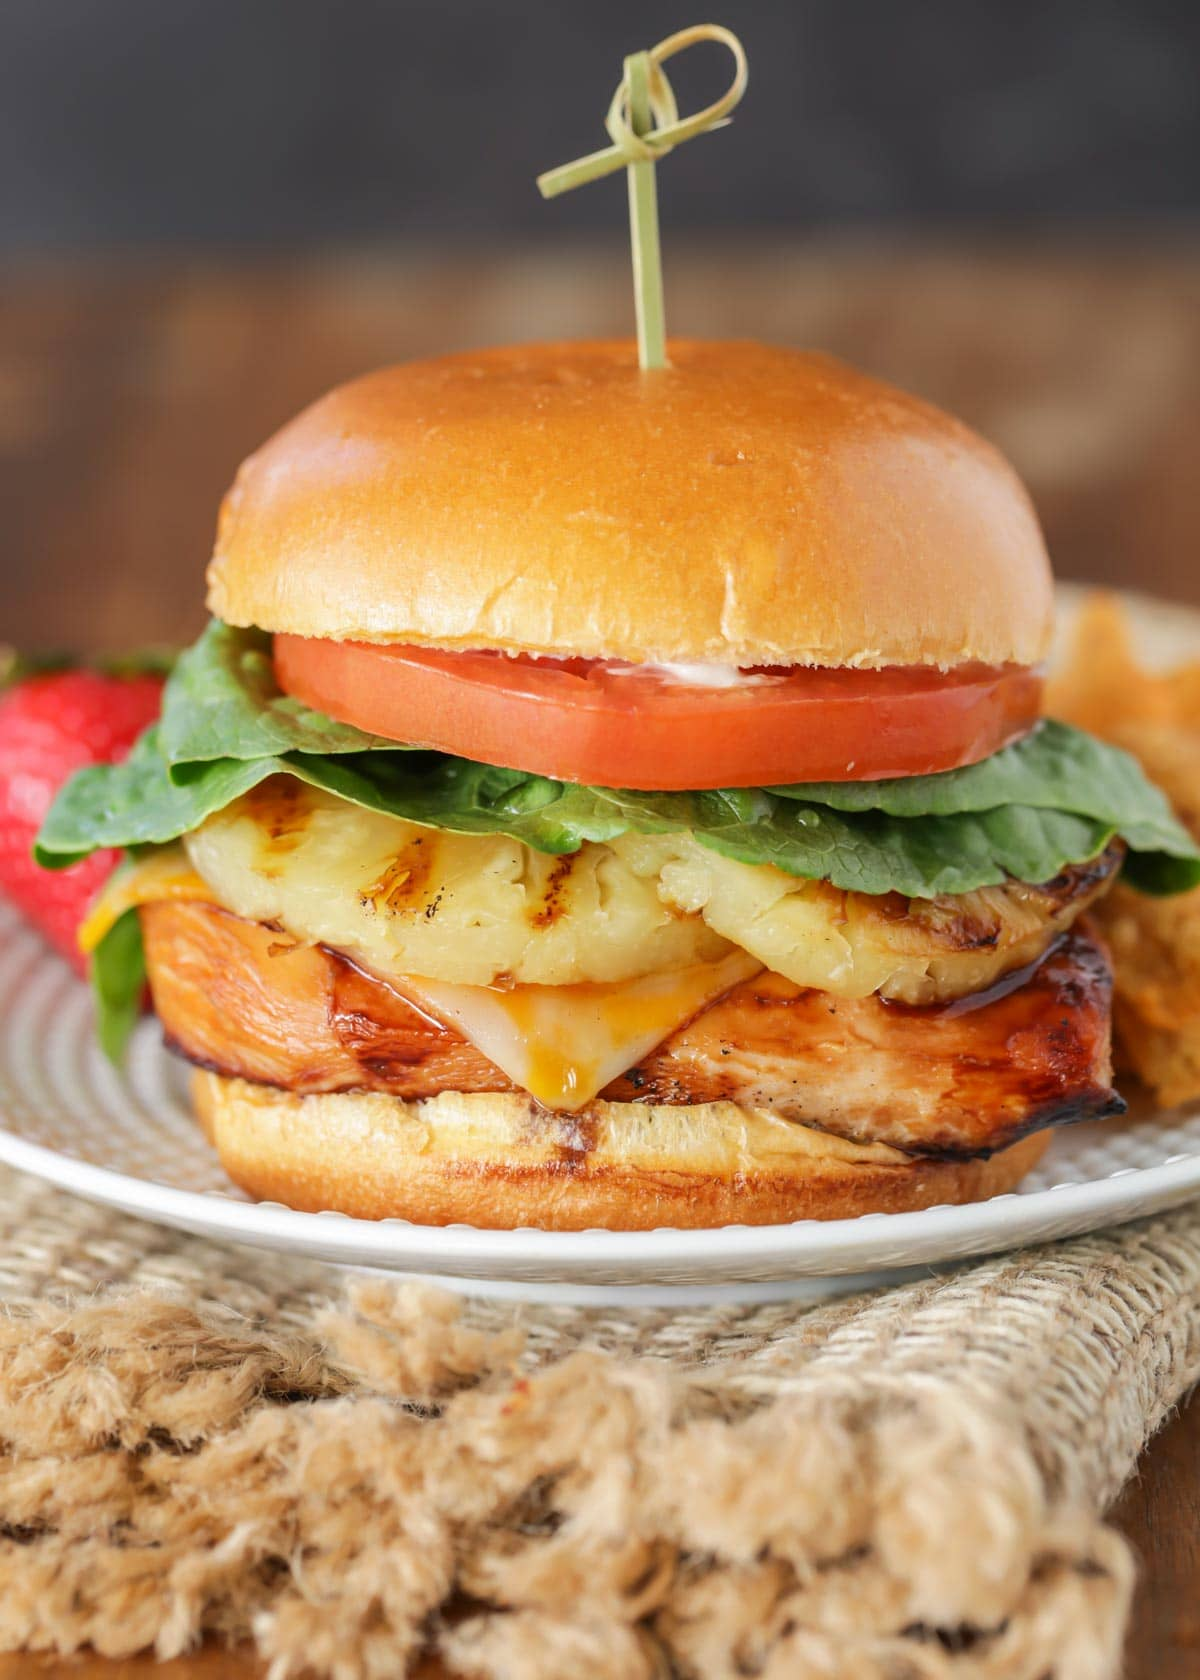 Teriyaki chicken burger recipe on plate